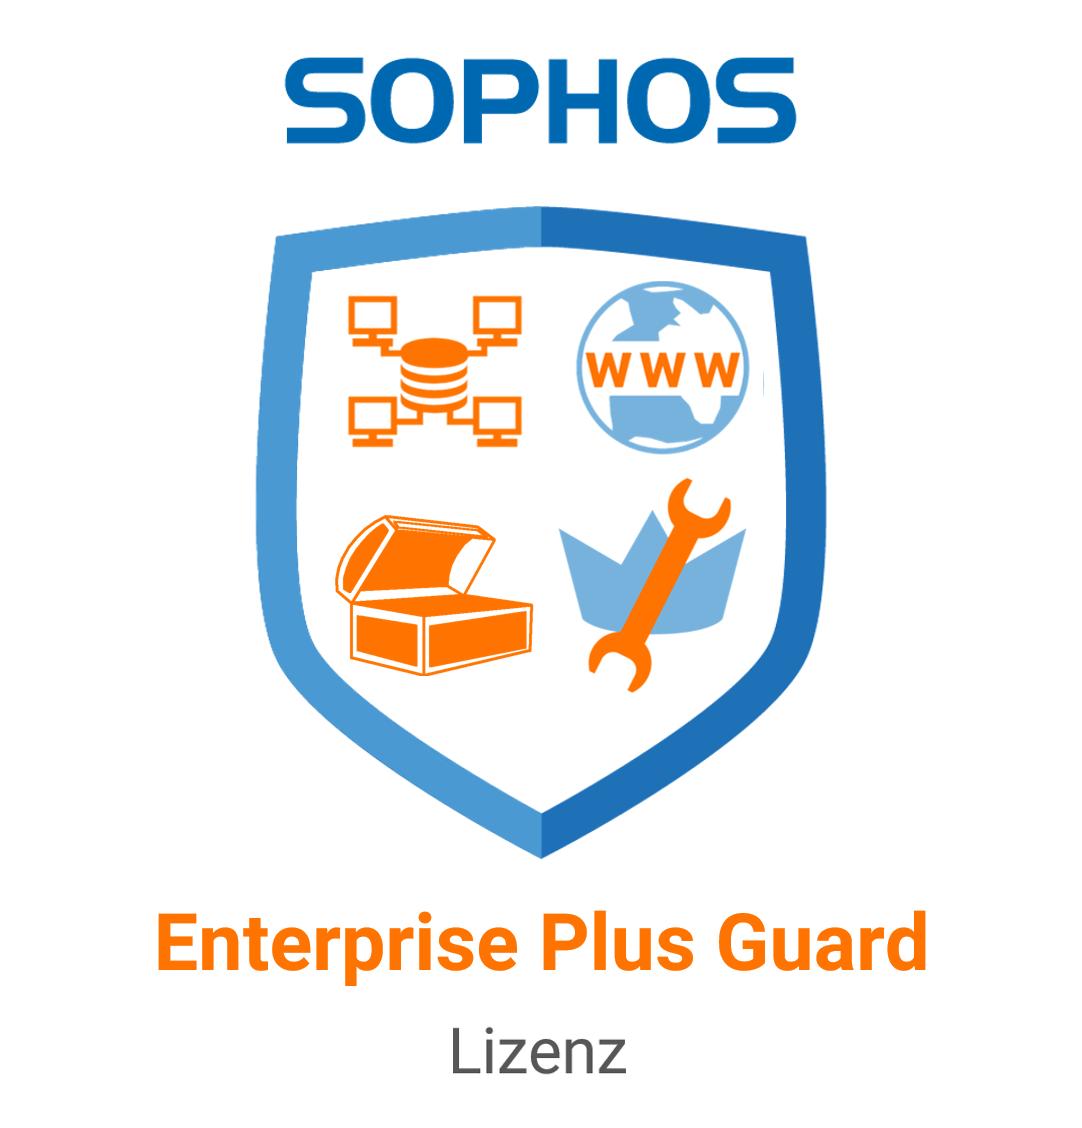 Sophos XG 650 EnterpriseGuard Plus